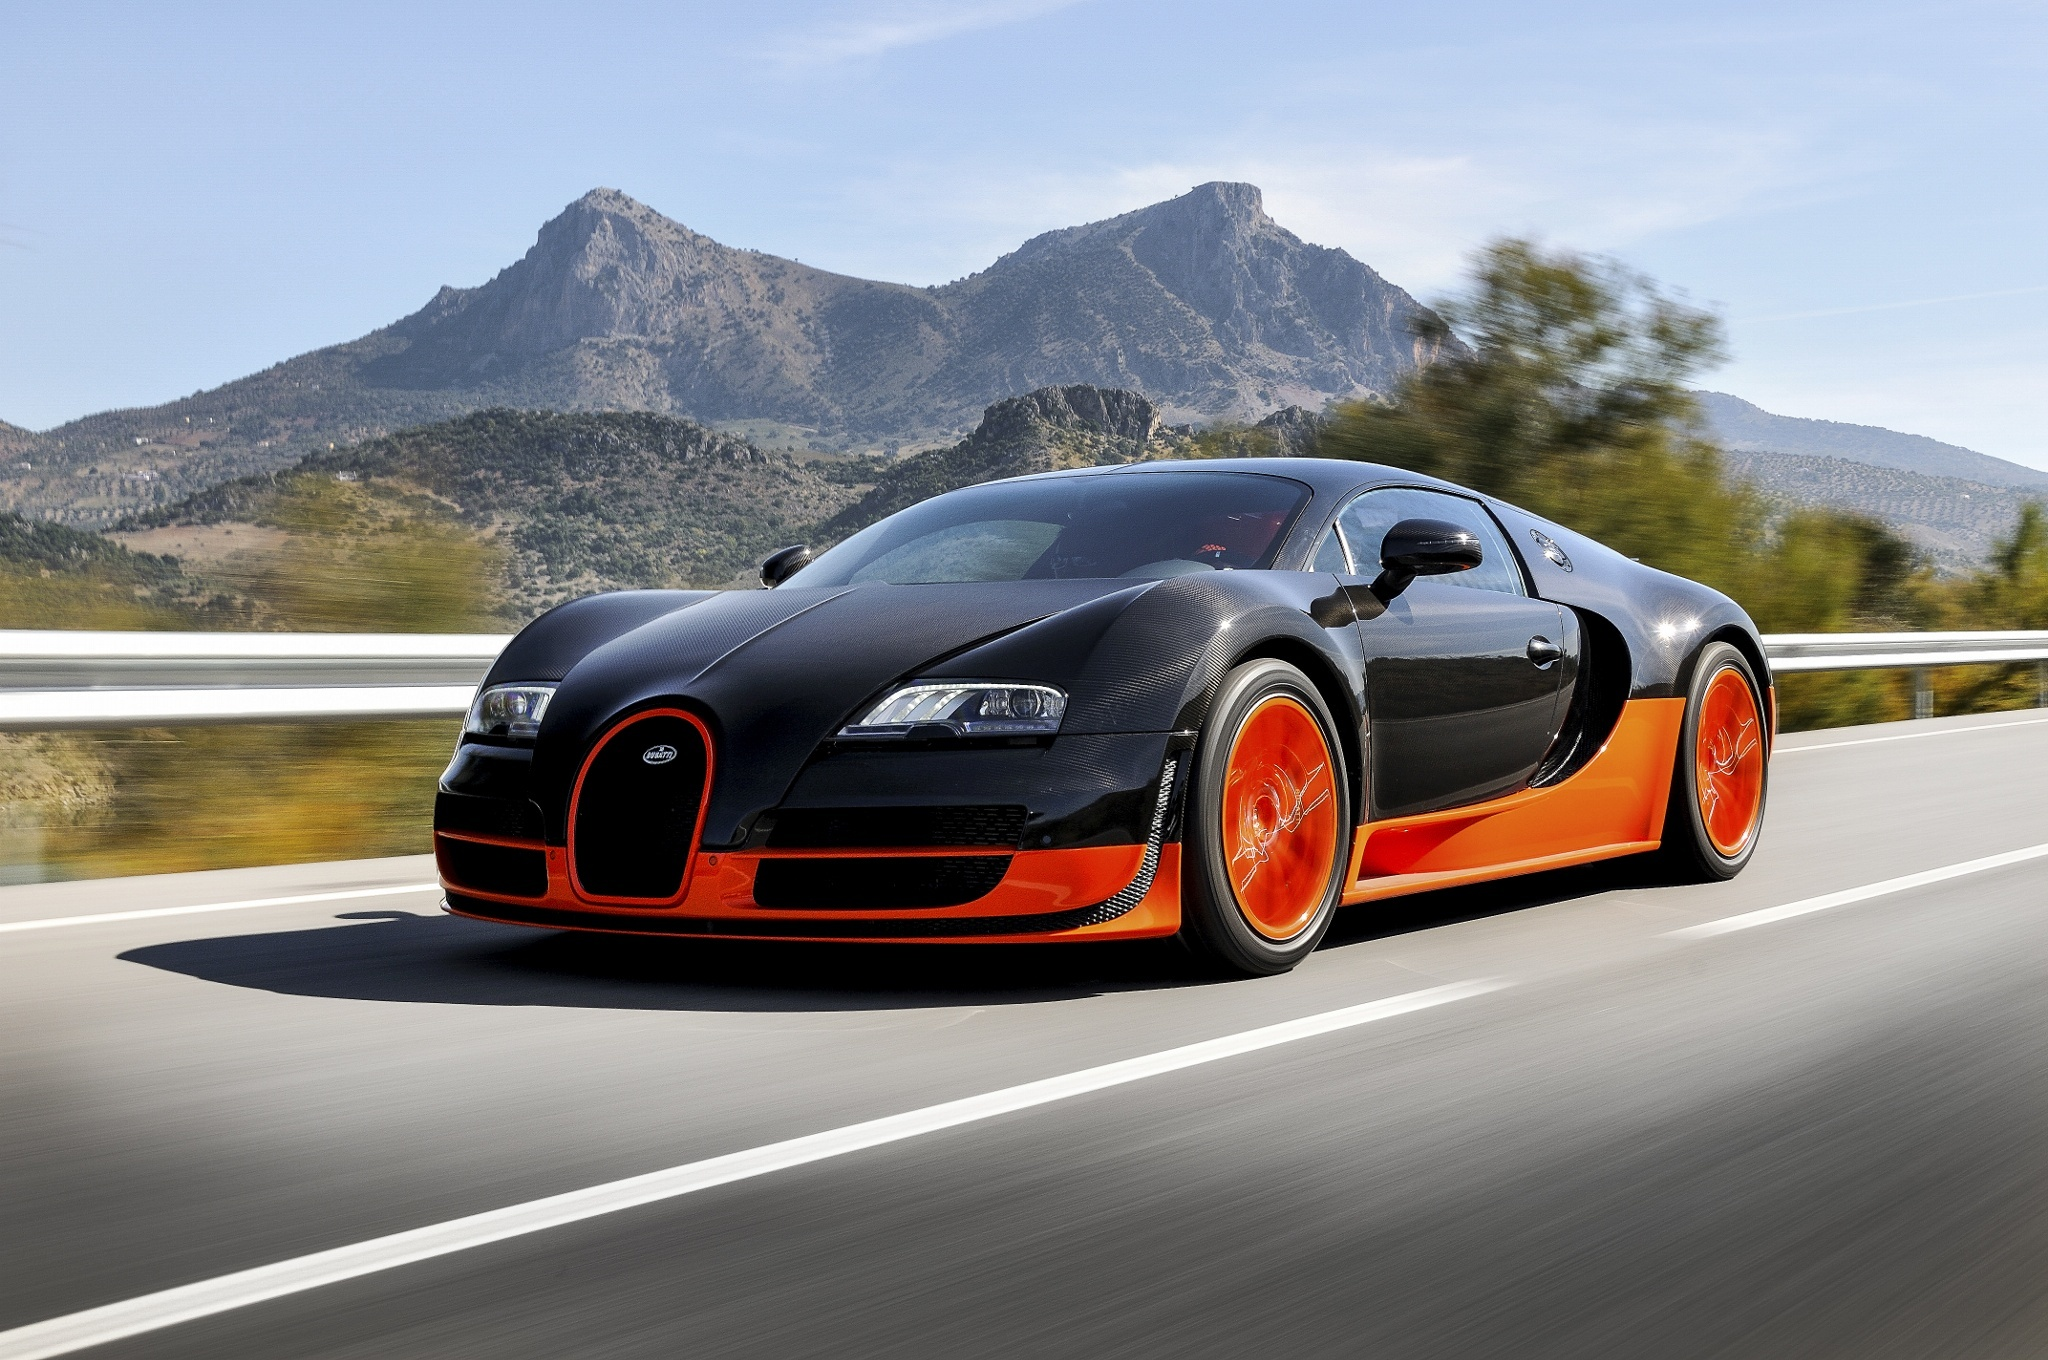 bugatti-veyron-foto